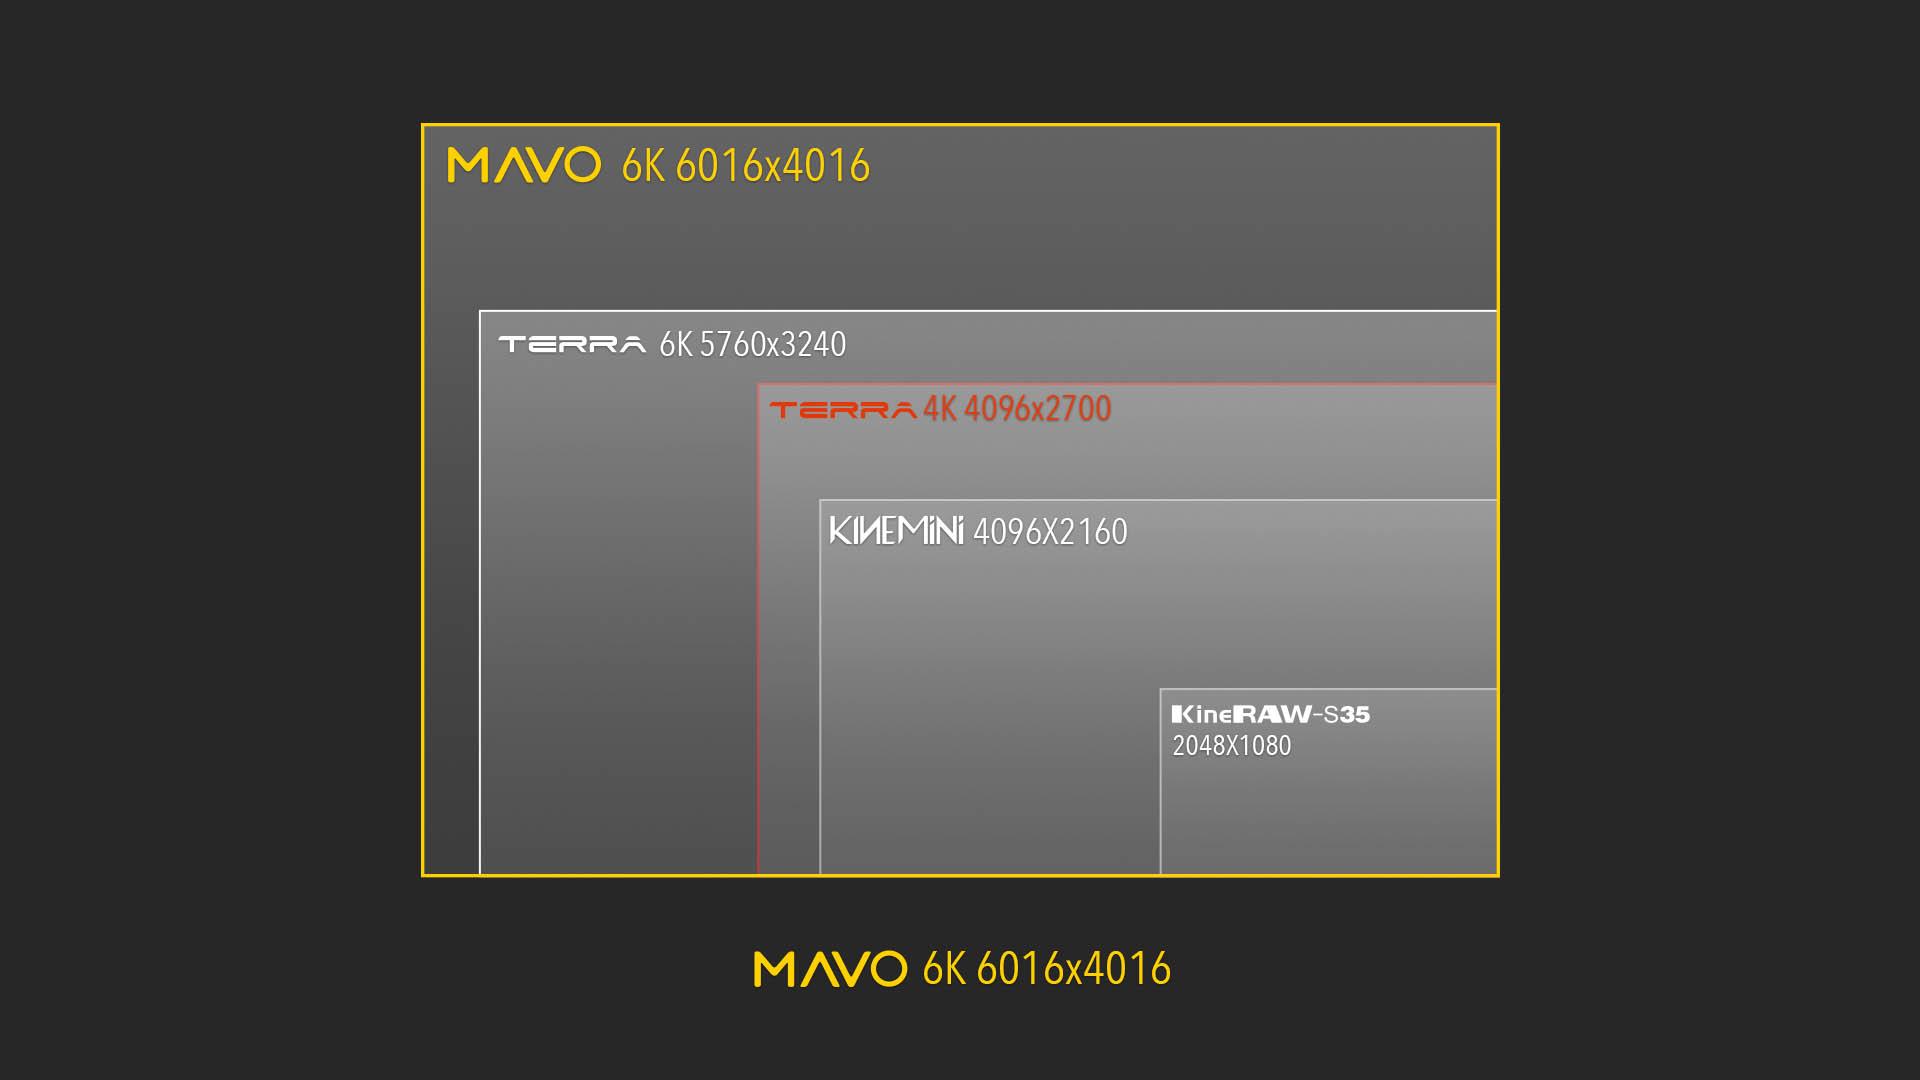 Kinefinity Mavo 6k Premium Pack with Kinemount and DarkTower Wireless System